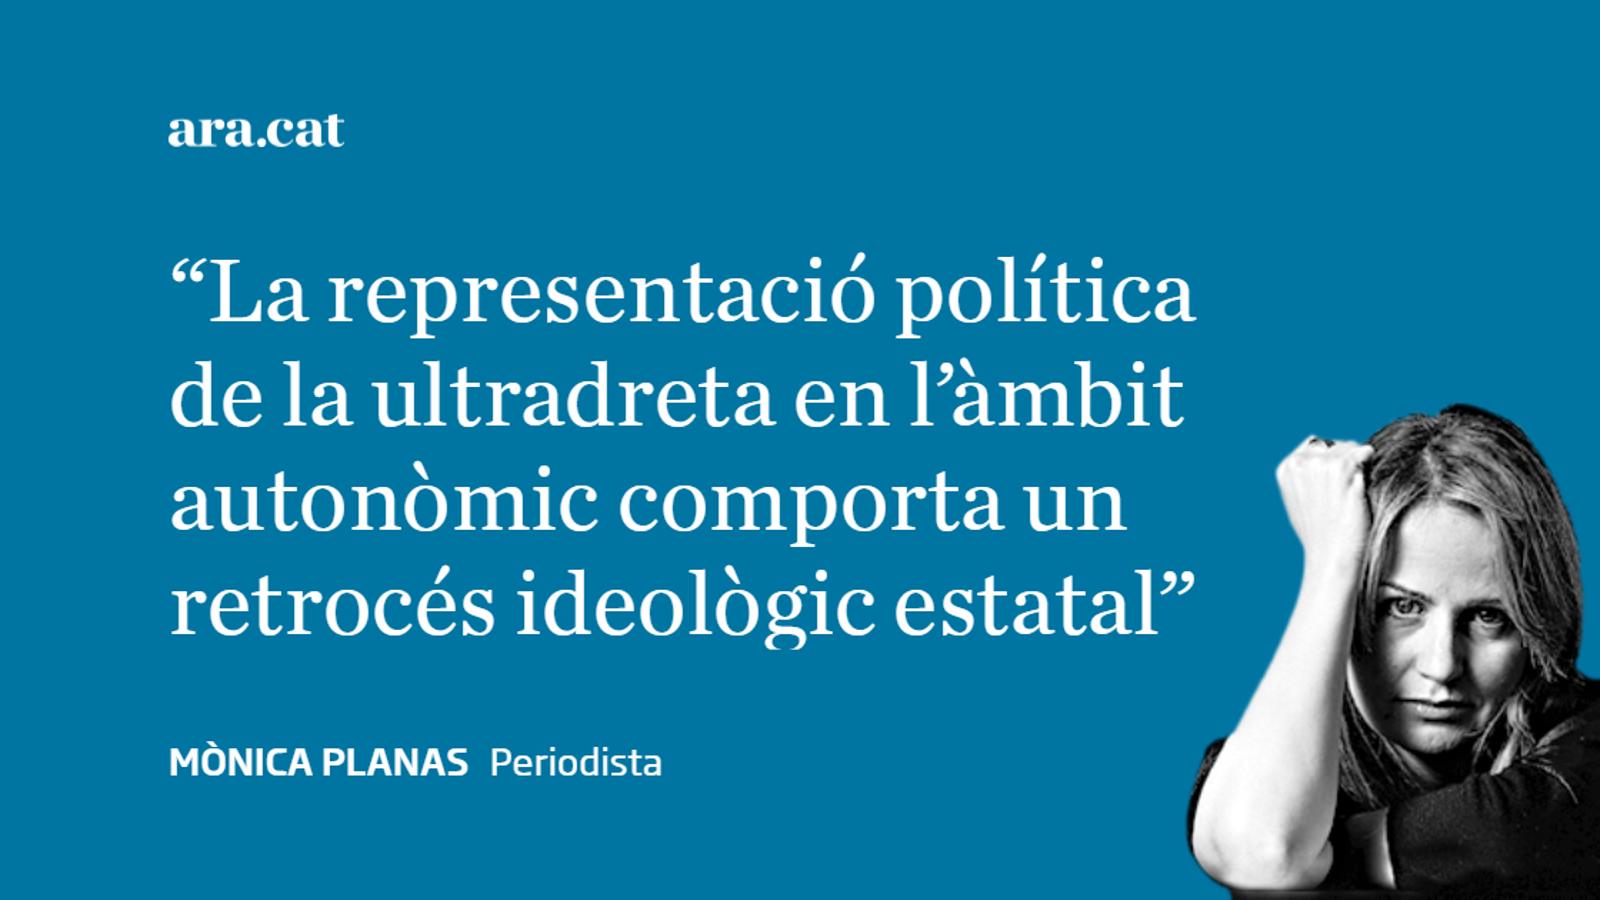 Susanna Griso i la higiene democràtica